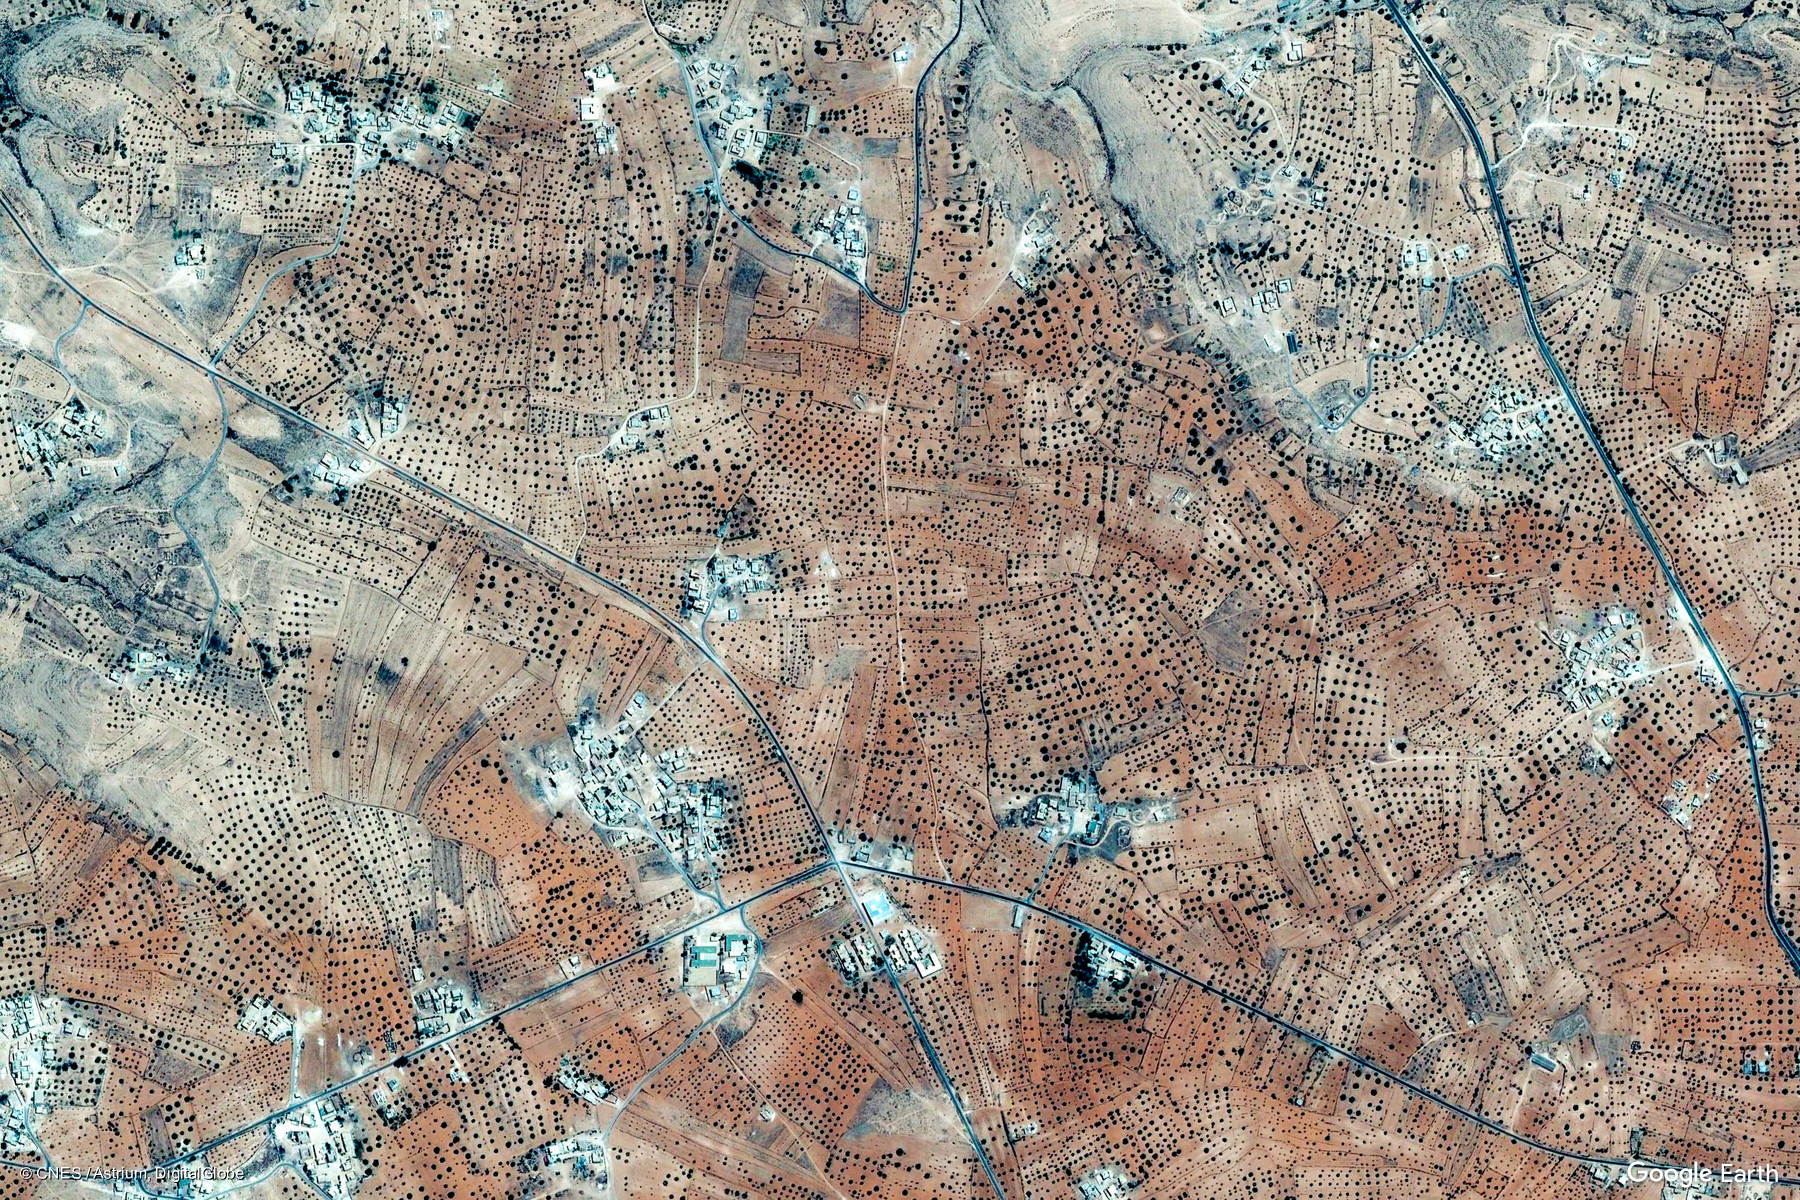 Ġaryān Libya Earth View From Google - Google maps earth view